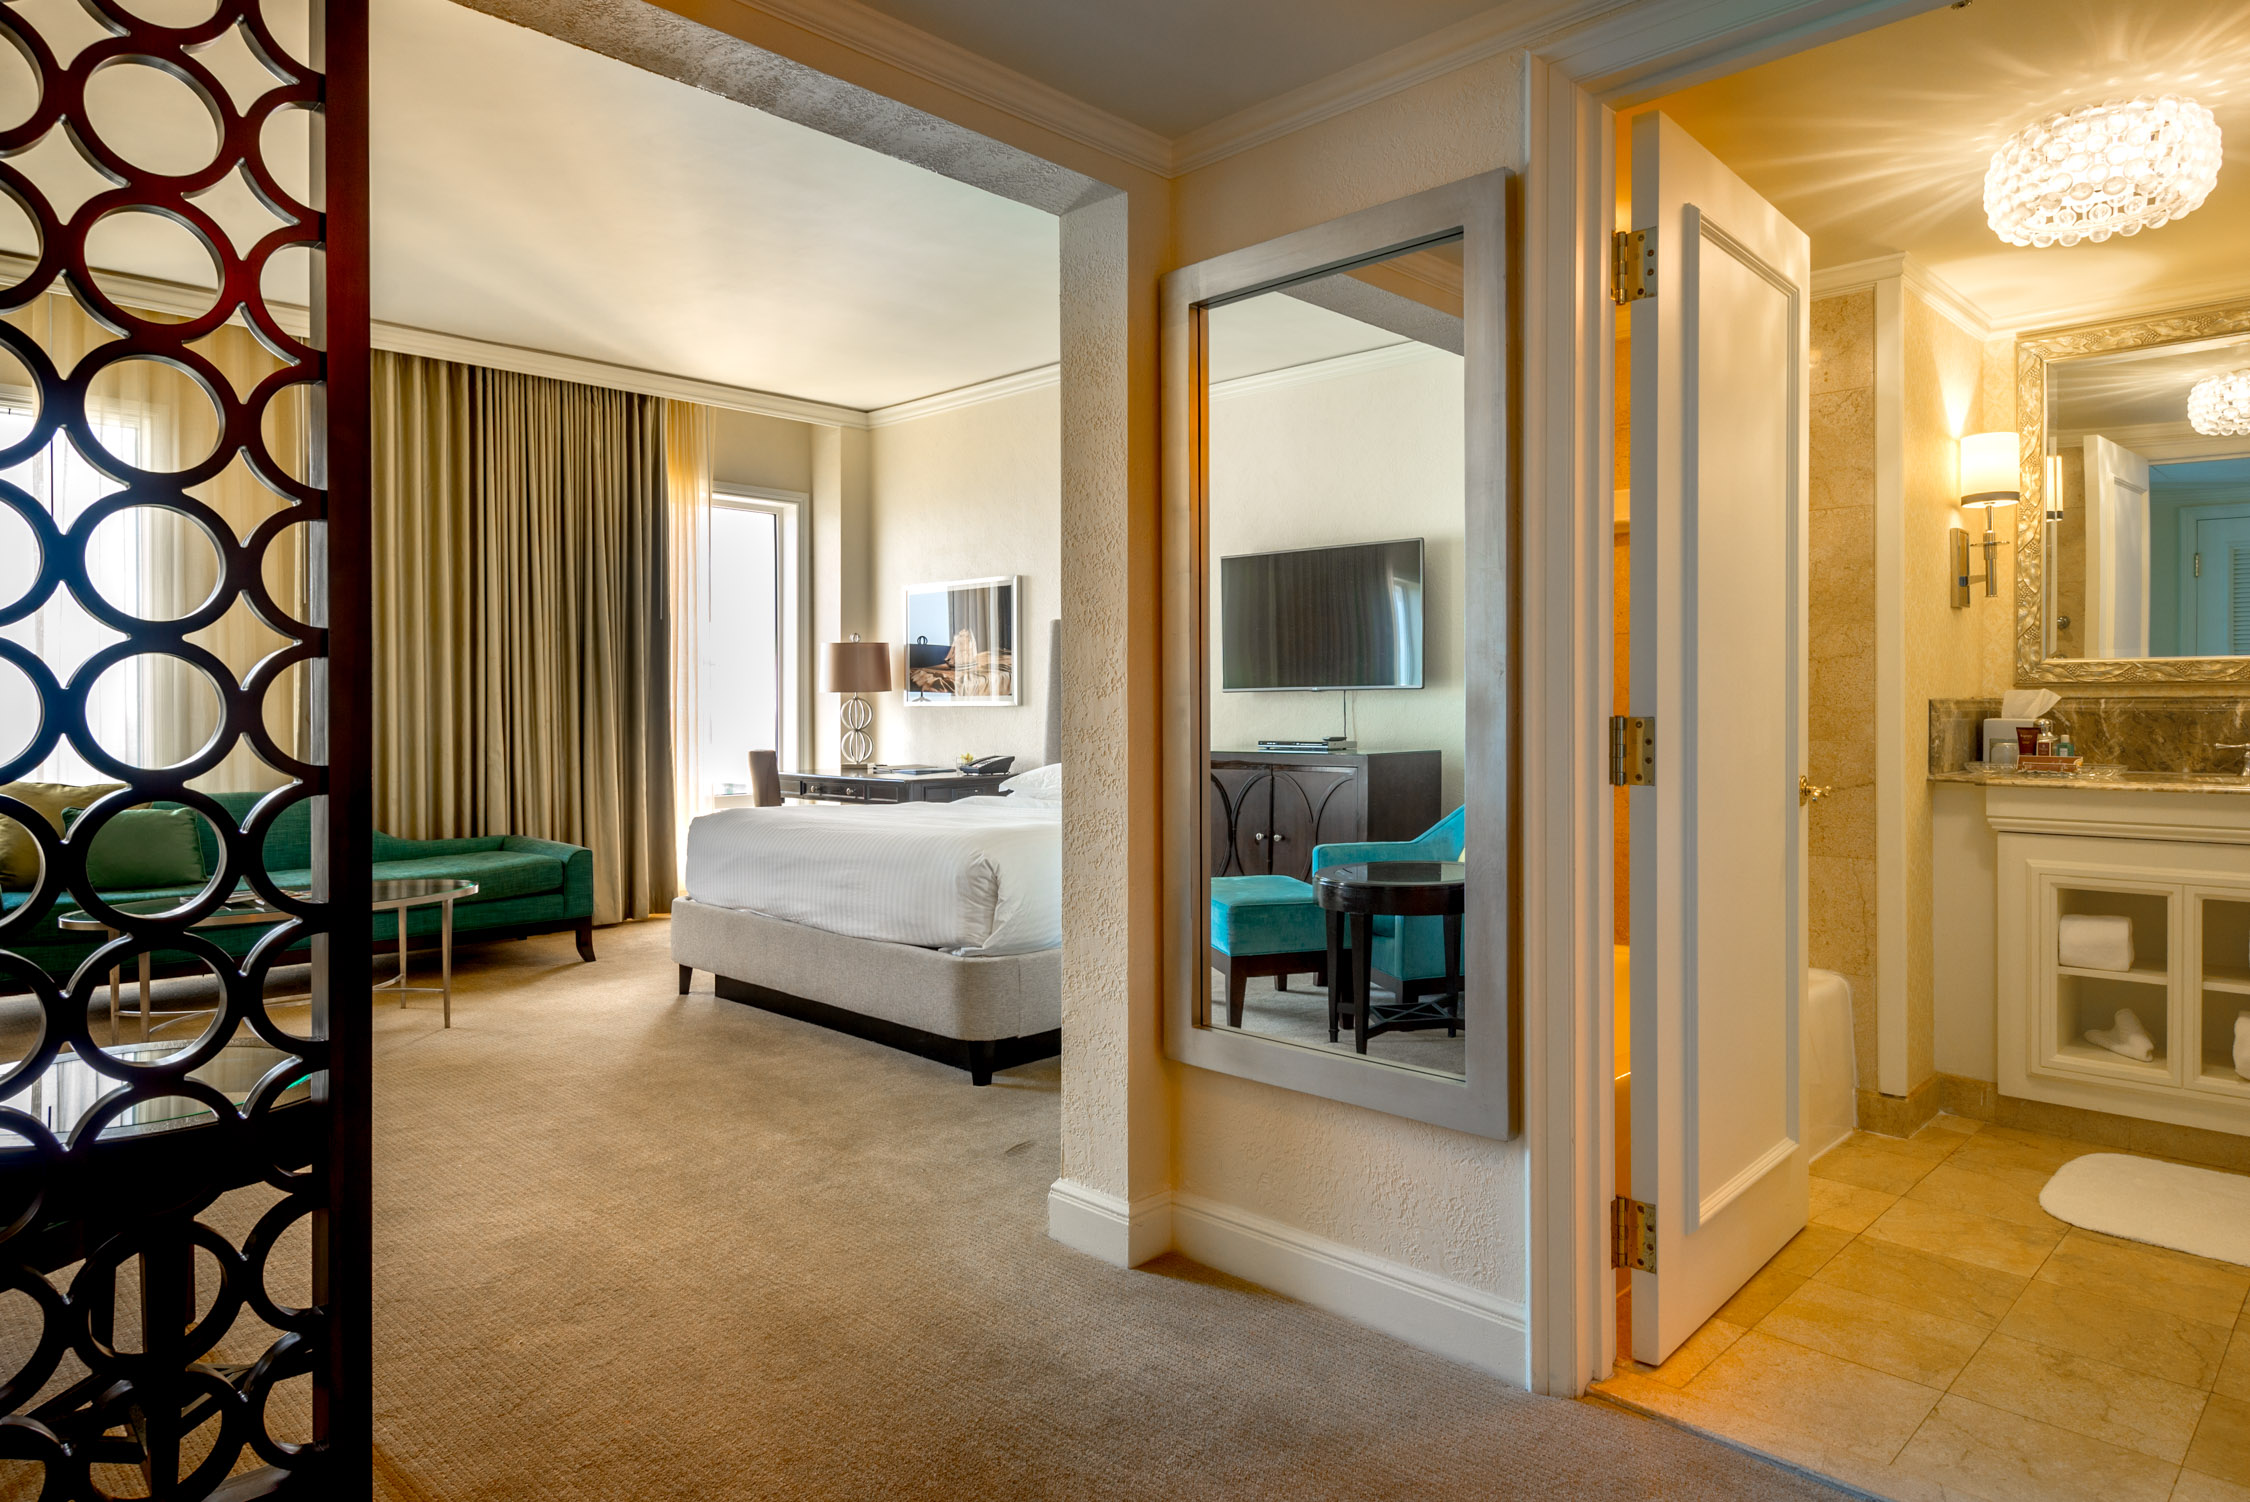 Our suite at The Ritz-Carlton, San Juan